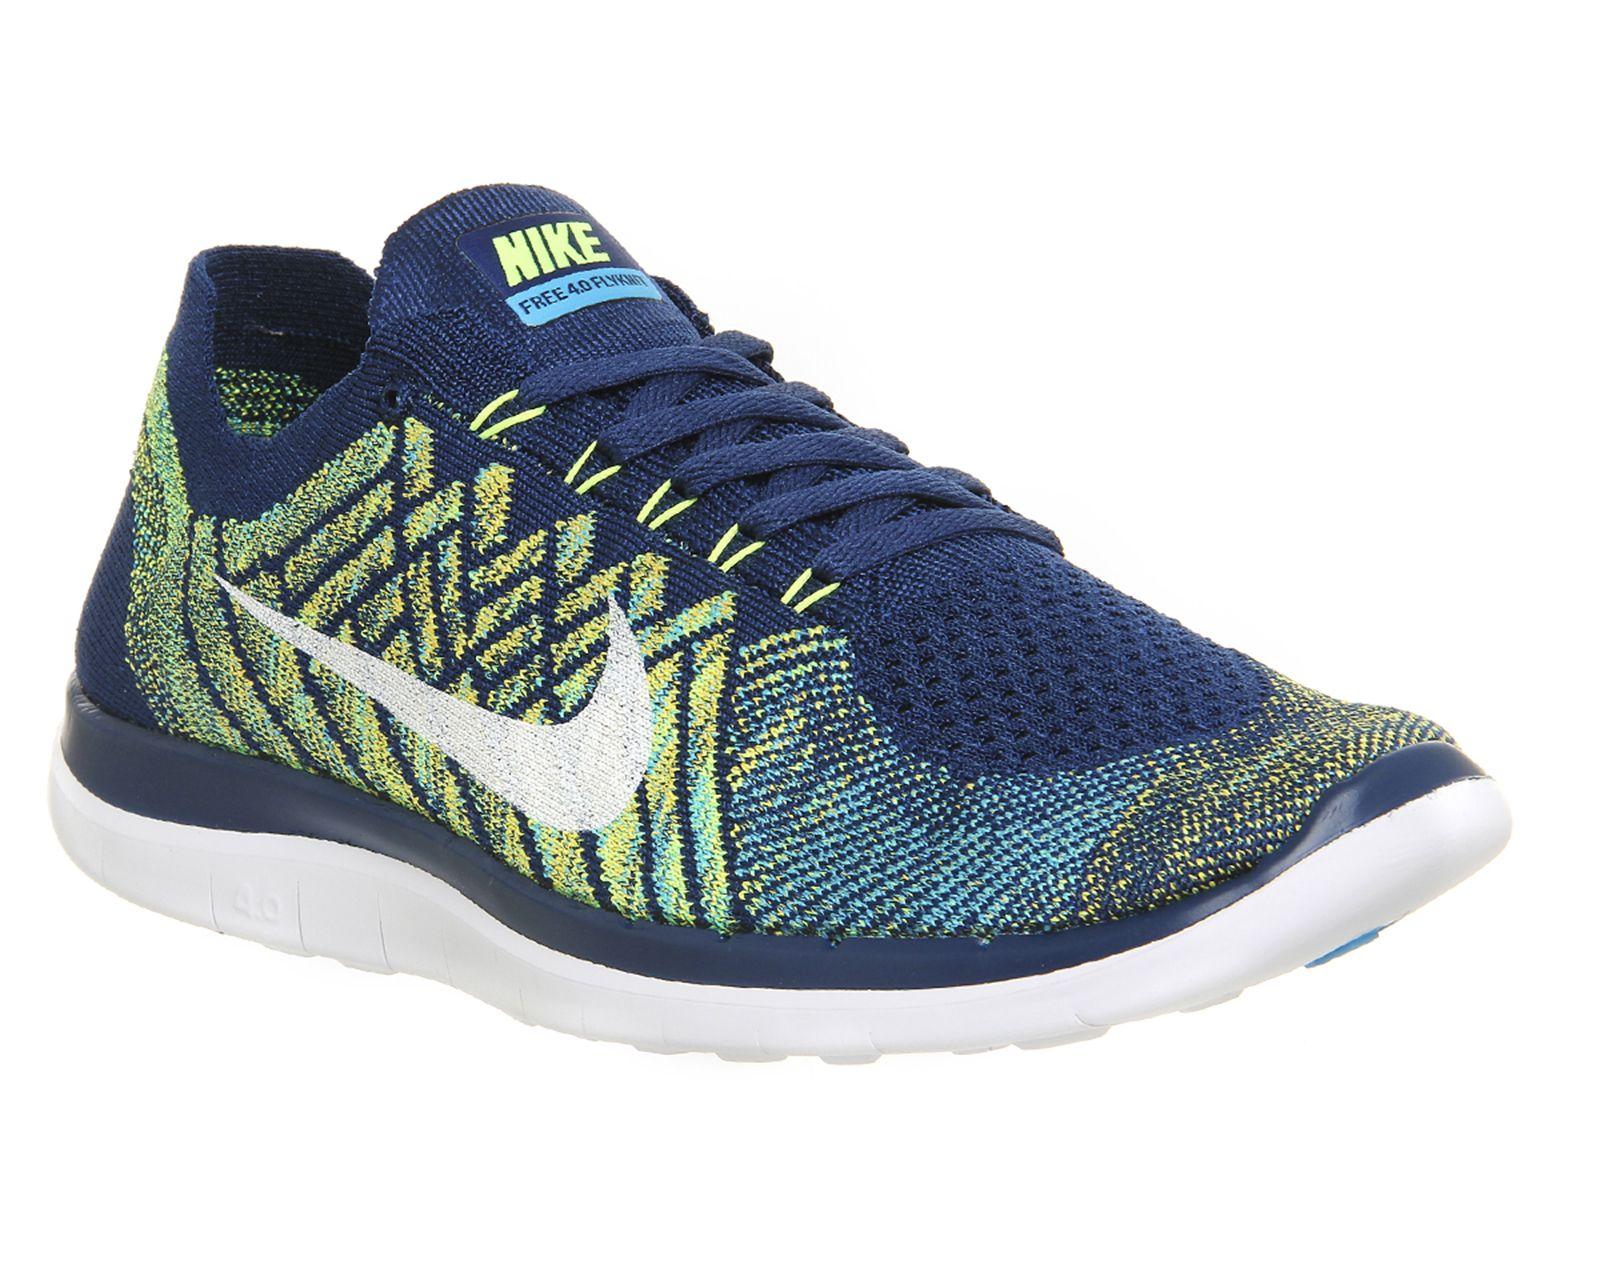 new york 6efe7 d1eaa Nike, Nike Free 4.0 Flyknit, Brave Blue White Black